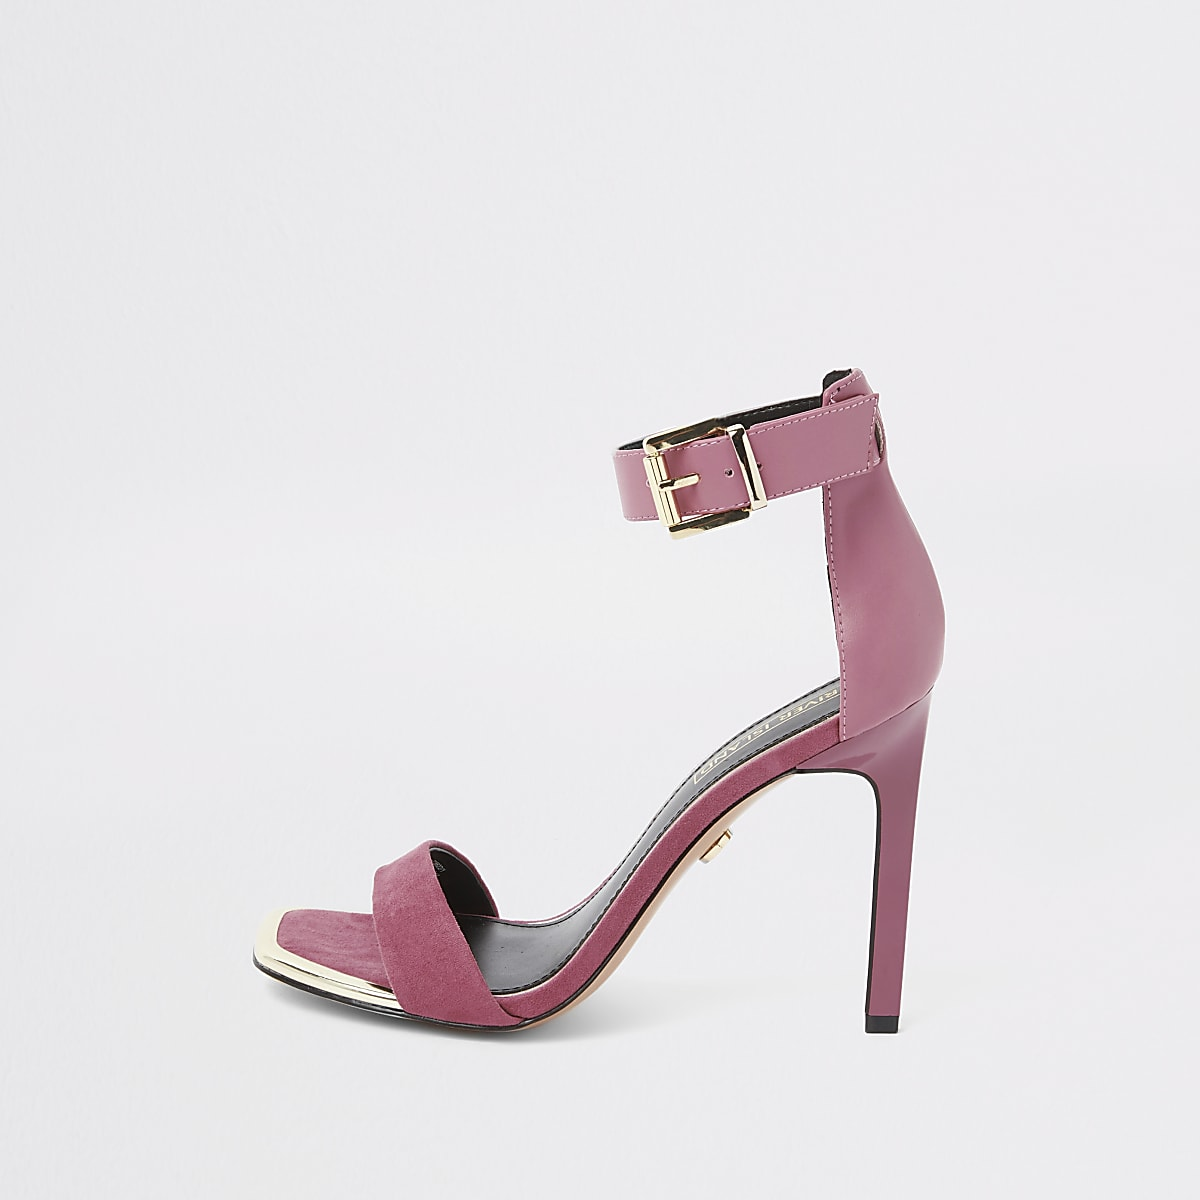 Sandales minimalistes en suédine roses